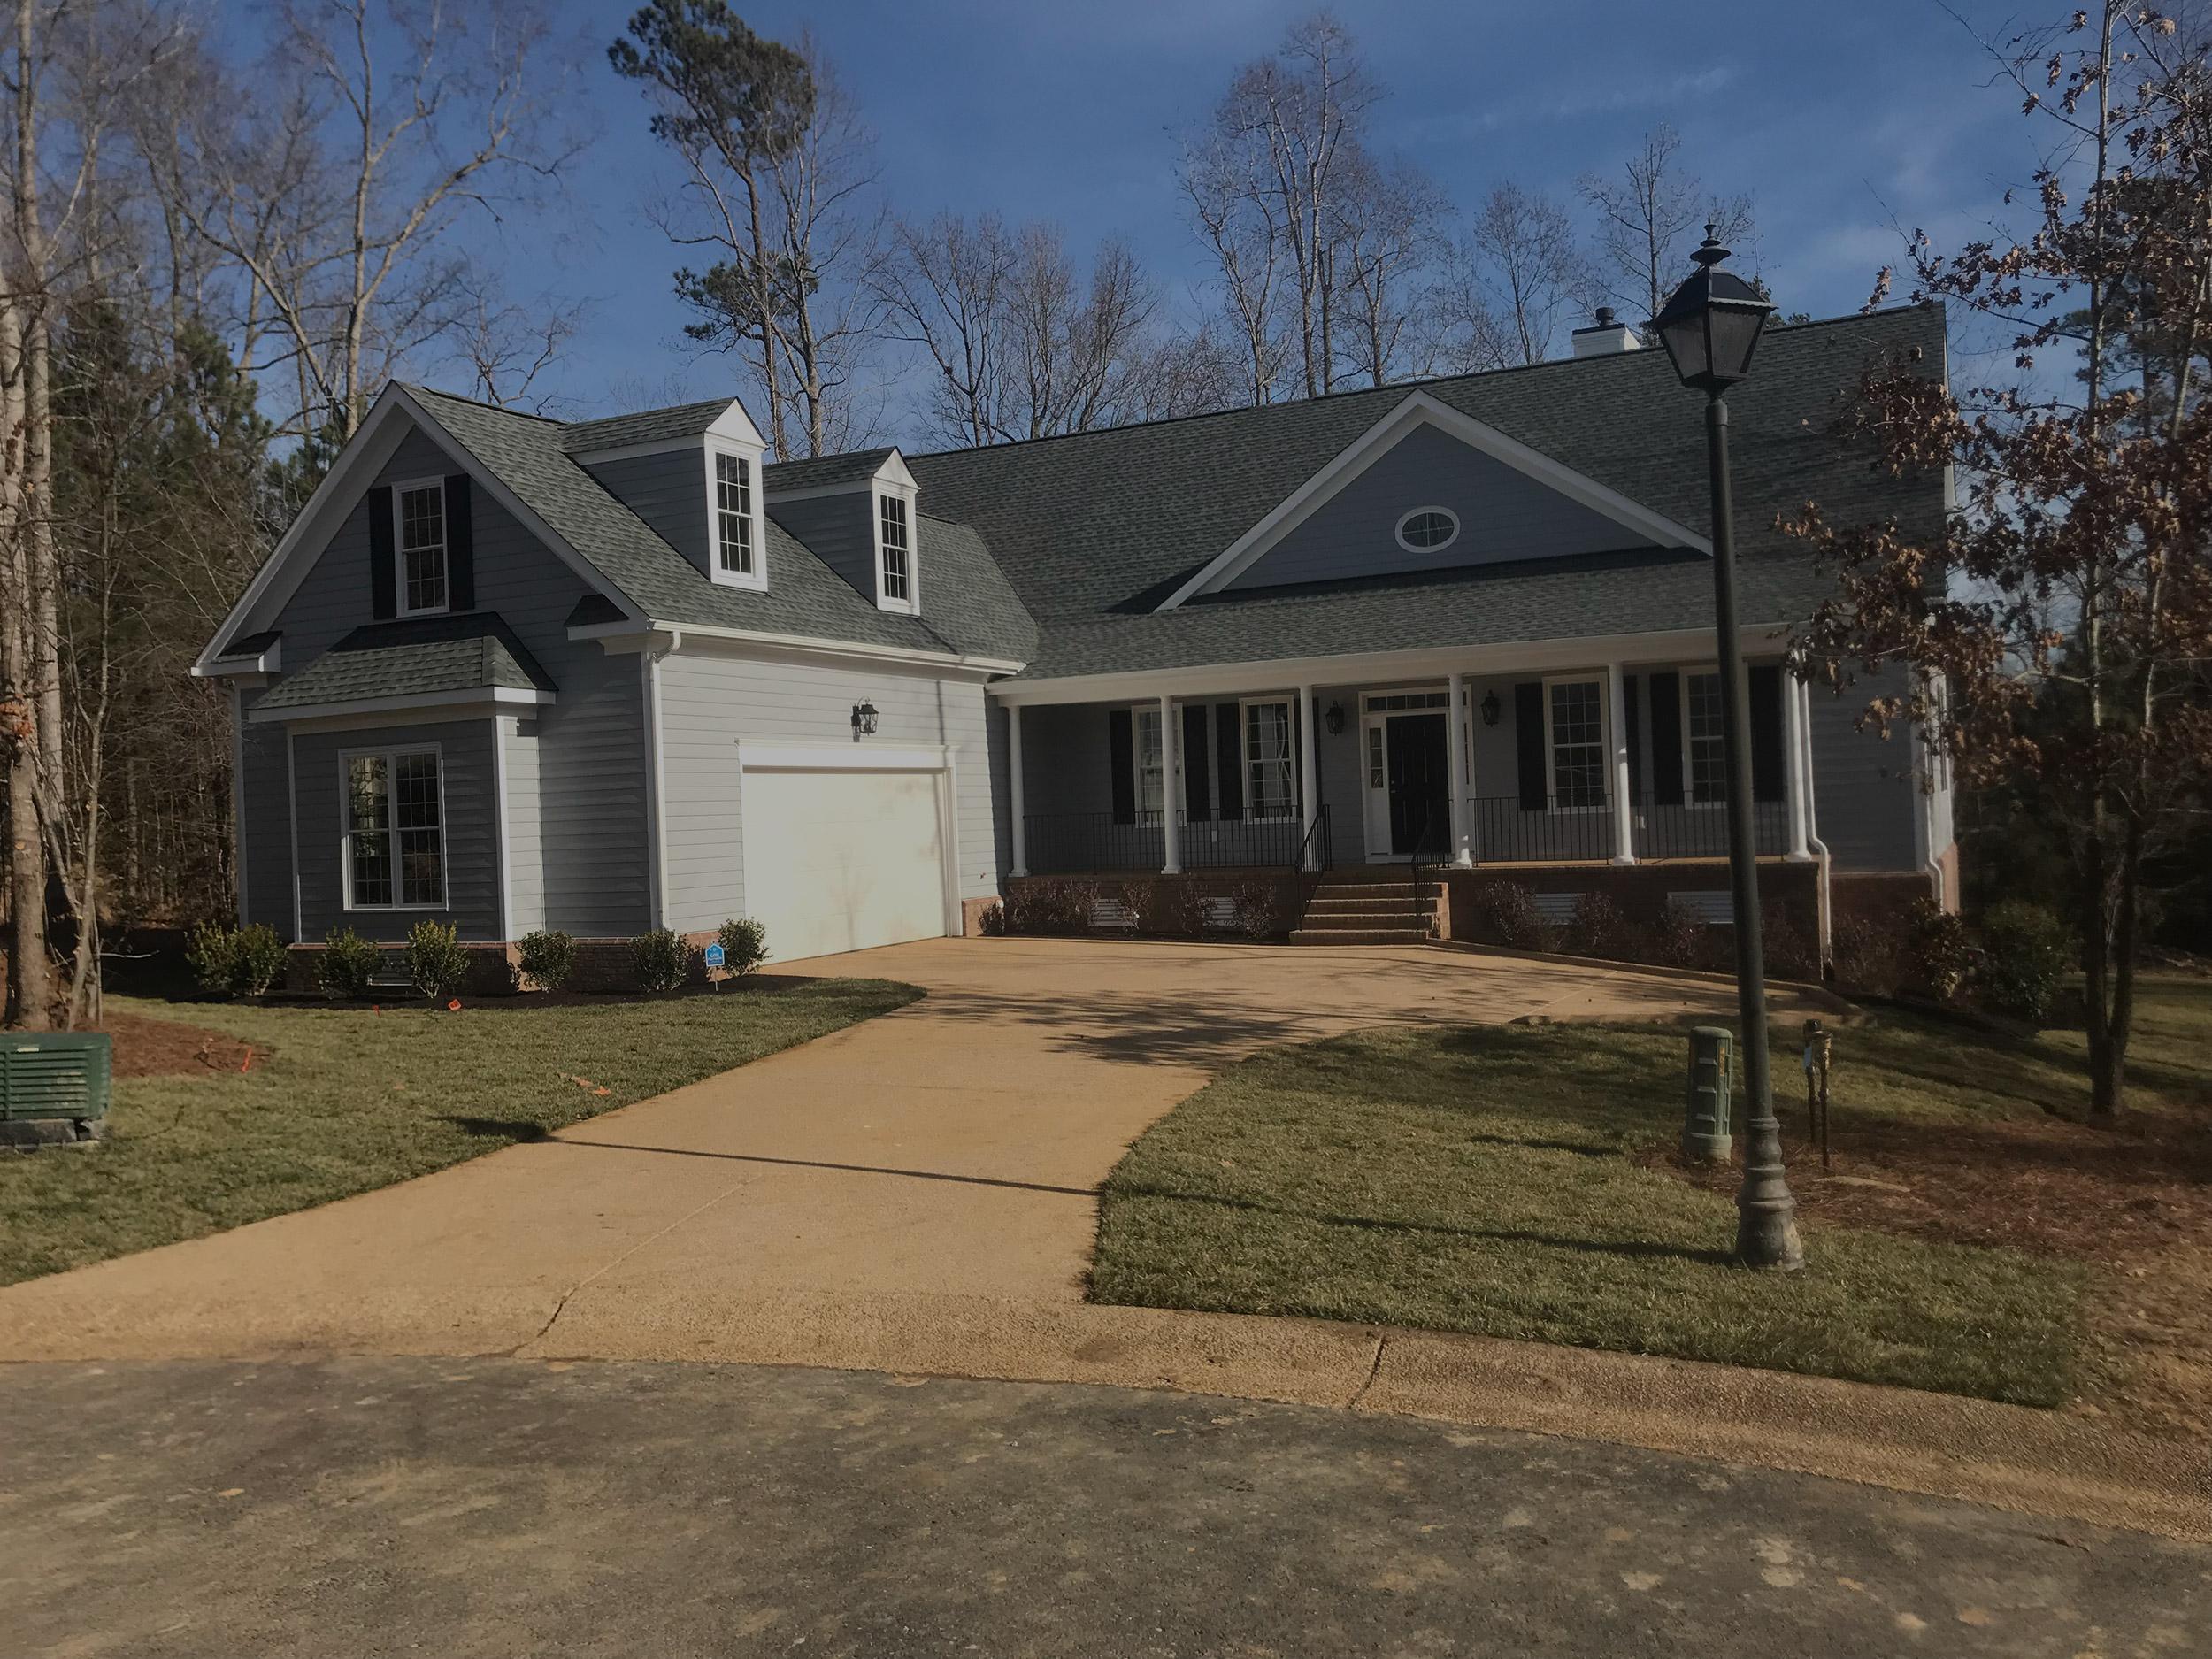 New House Construction, Williamsburg, Virginia